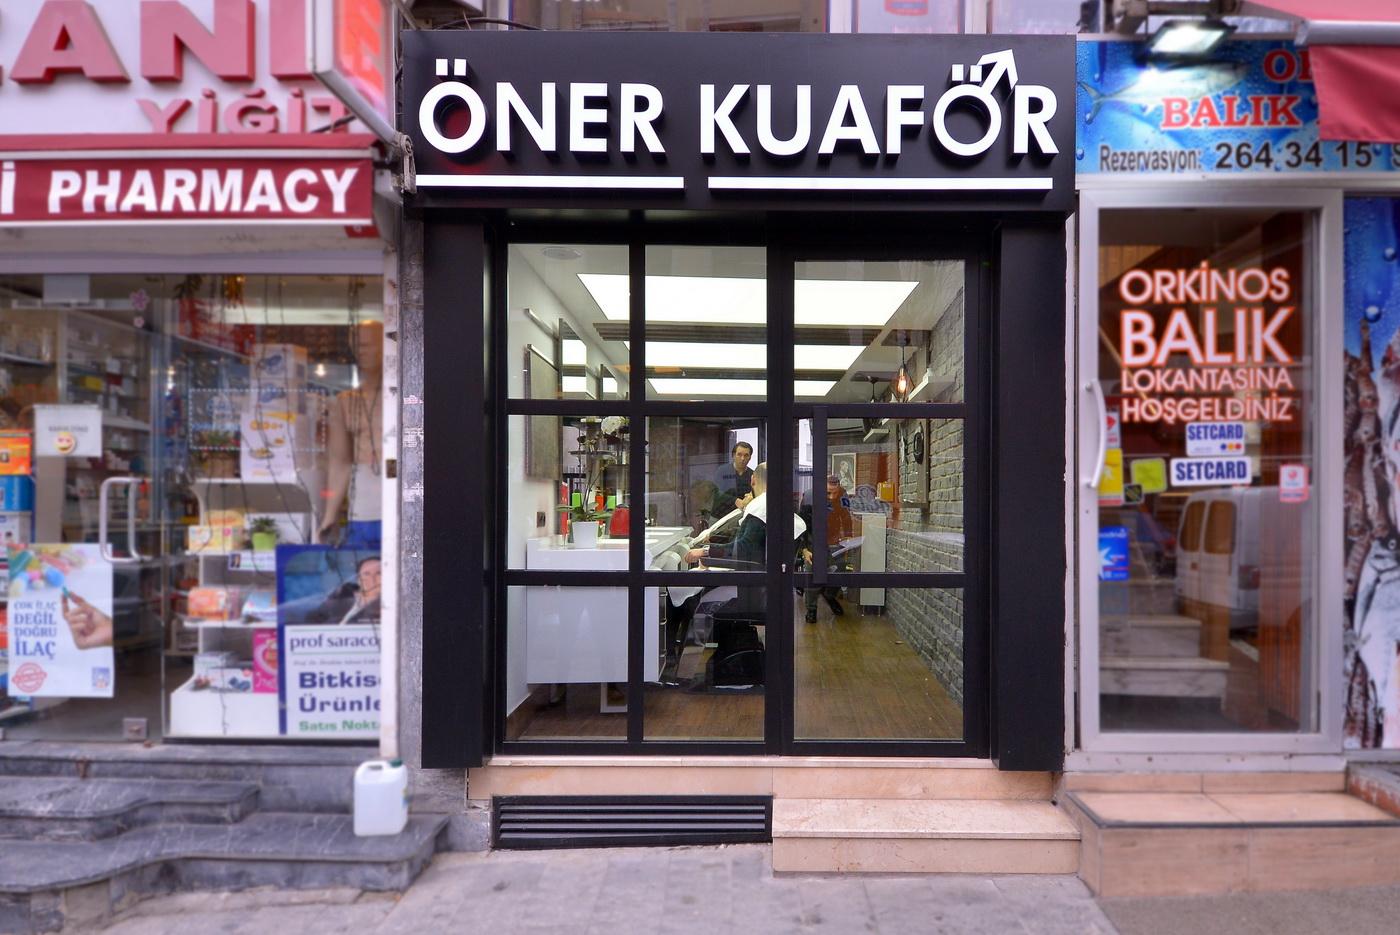 İstanbul - Öner Kuaför